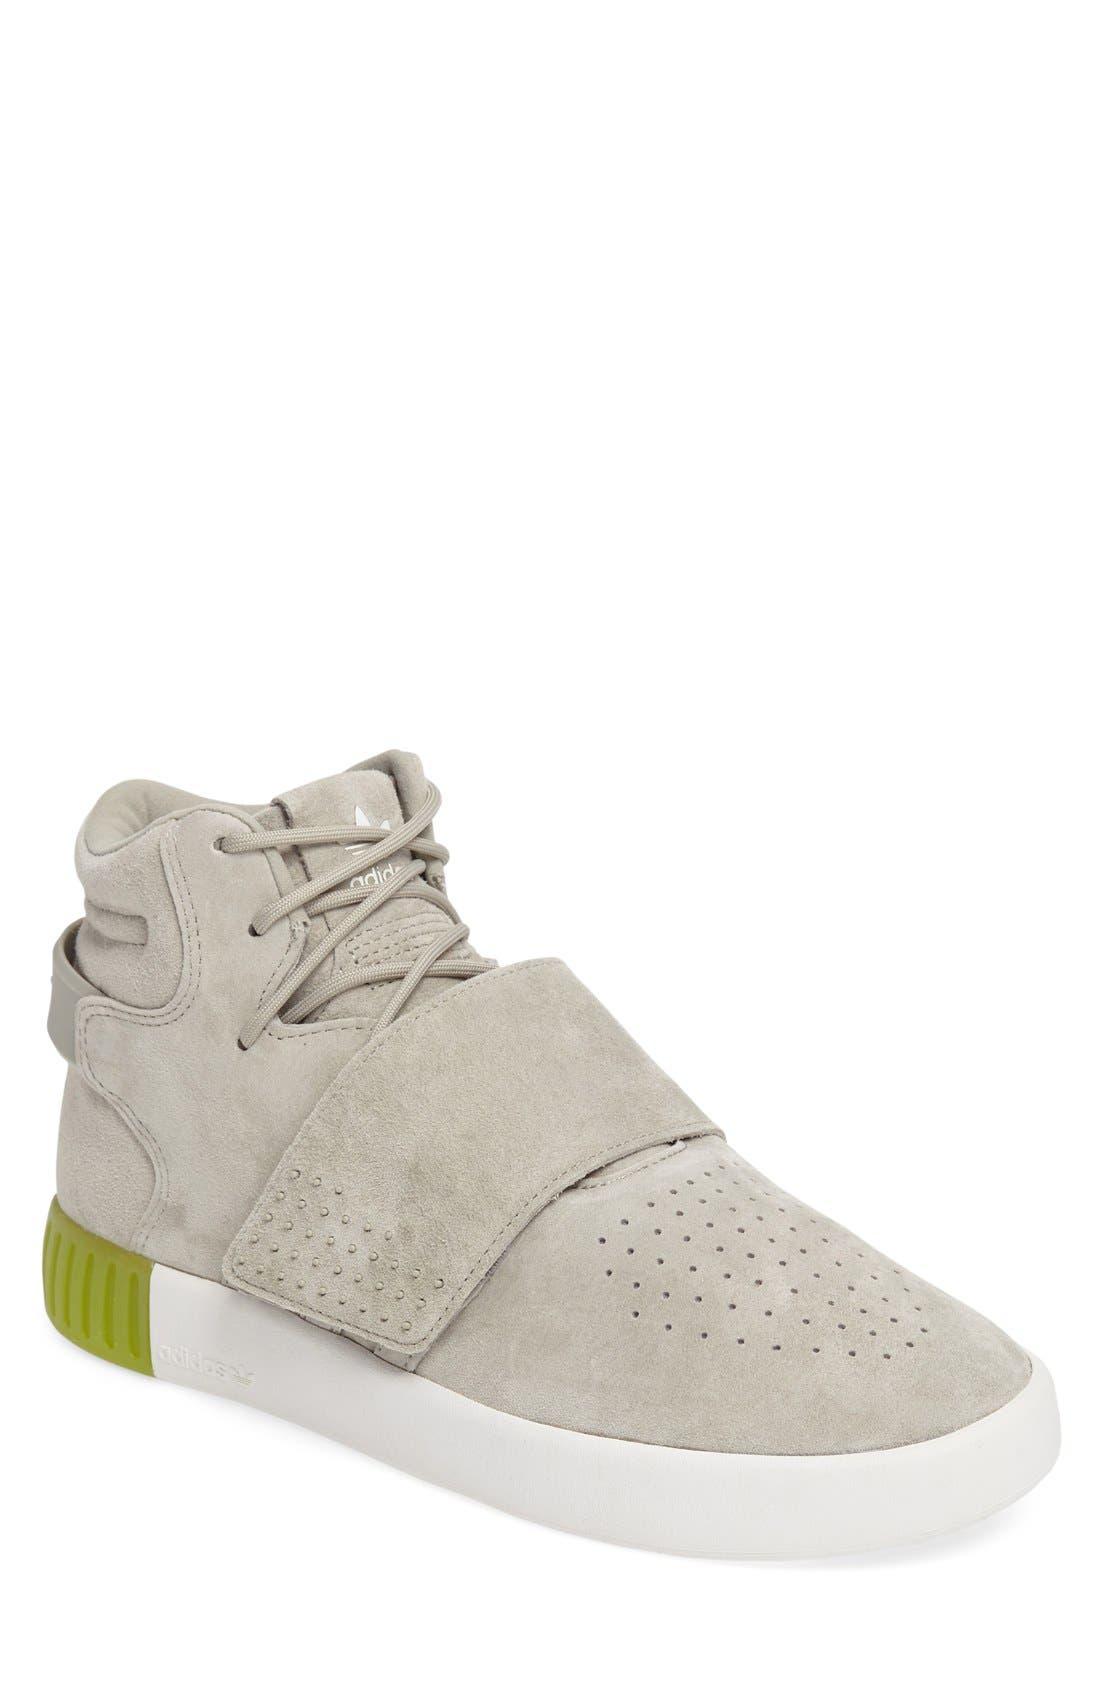 Alternate Image 1 Selected - adidas 'Tubular Invader' Sneaker (Men)